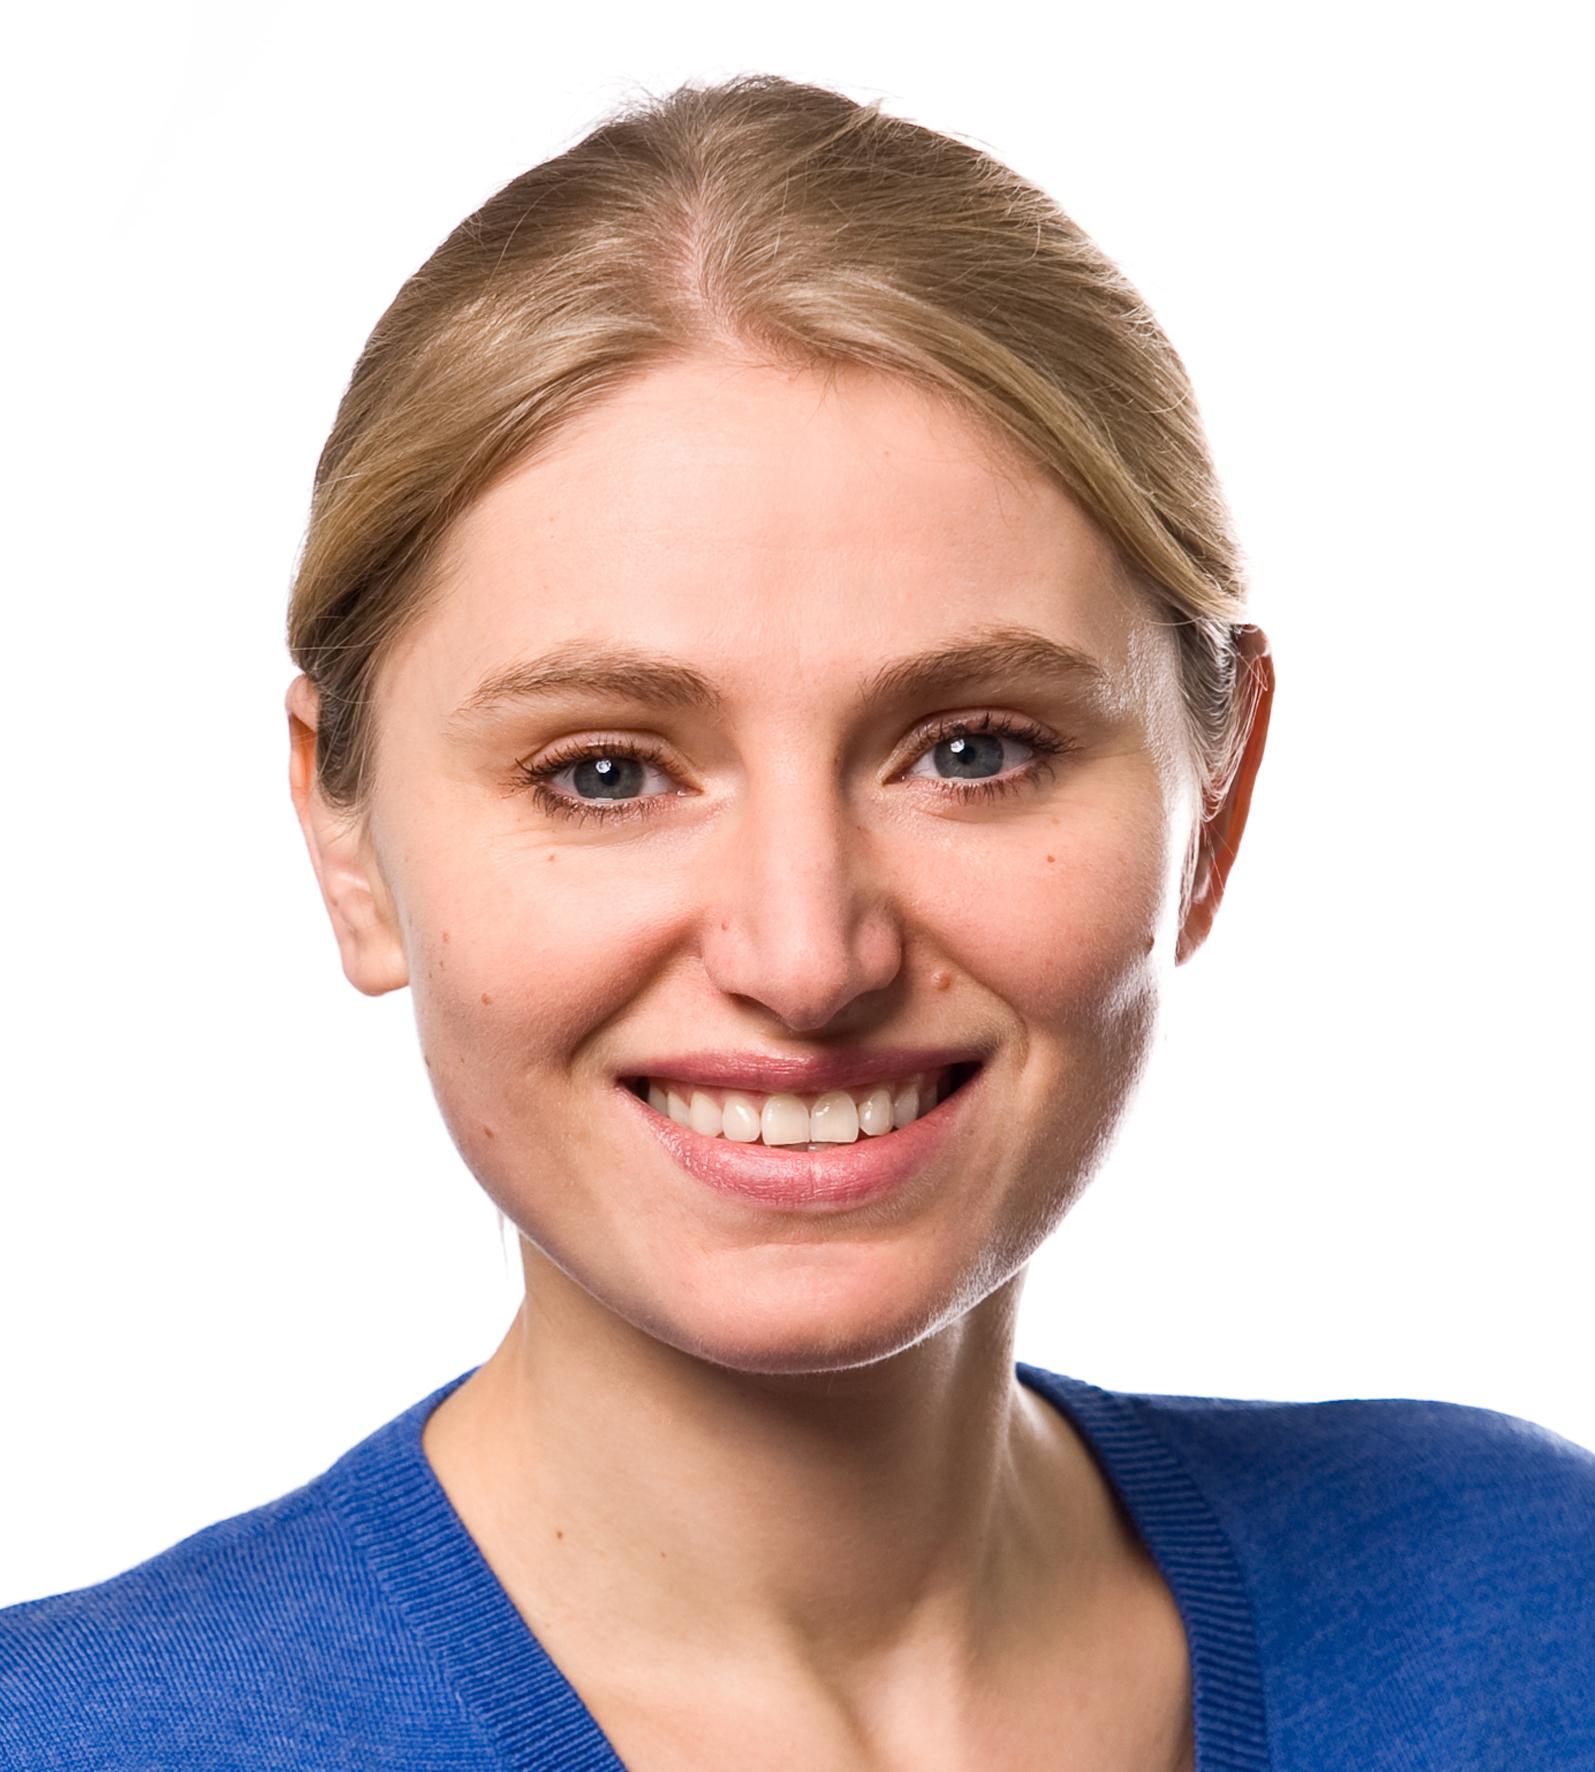 Nelli Schulz